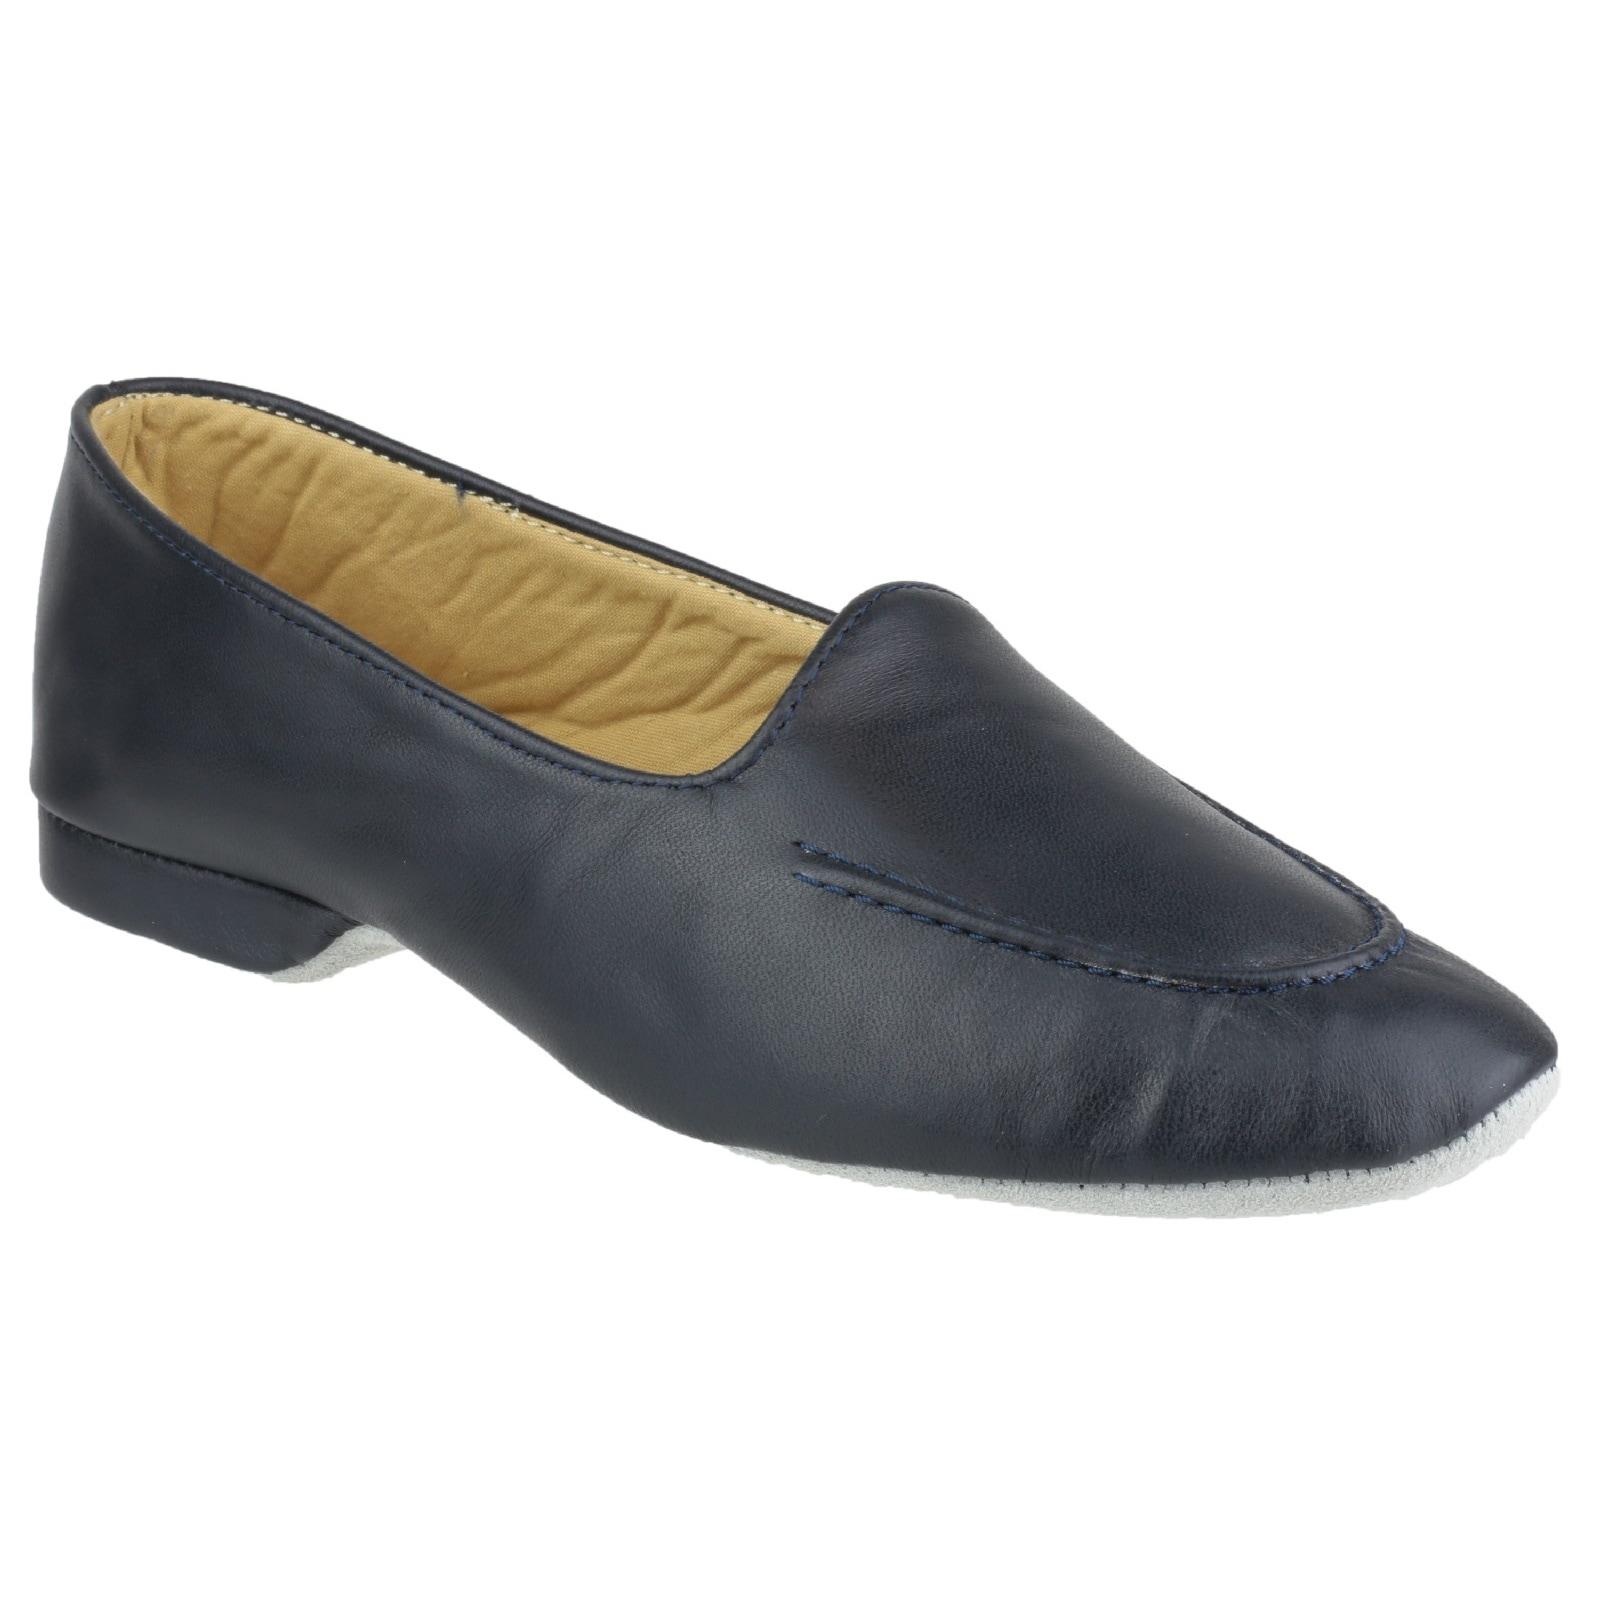 Cincasa Menorca Hausschuh Fornells Damen e   Schuhe > Hausschuhe > Klassische Hausschuhe   Cincasa Menorca